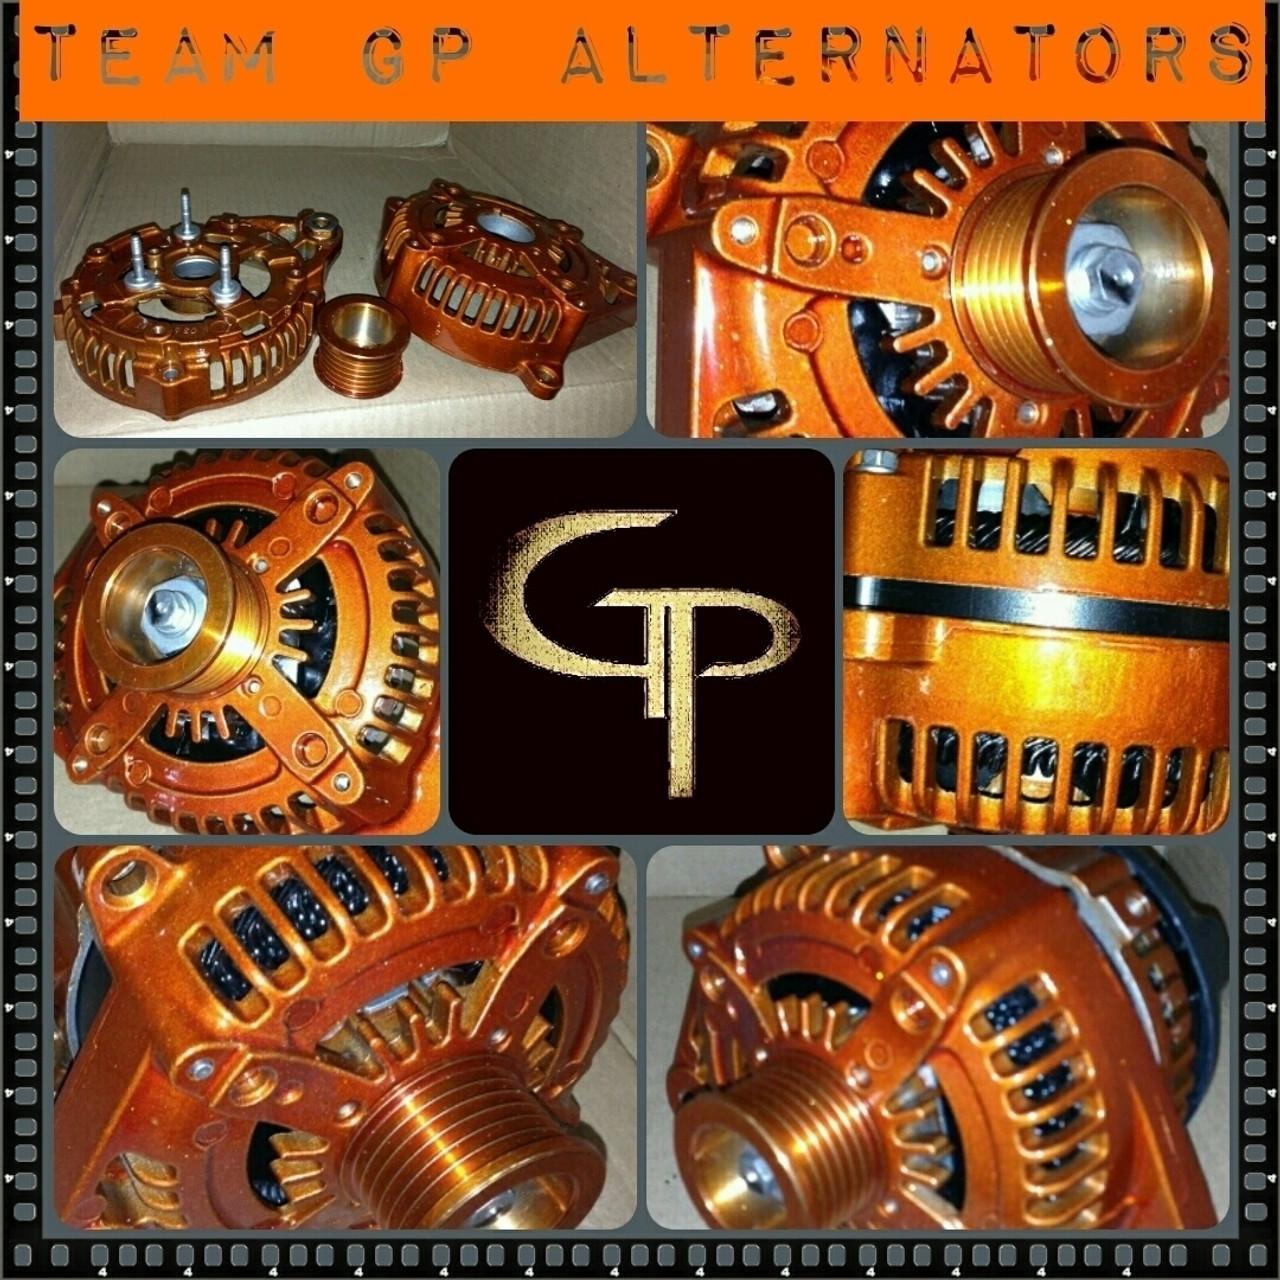 TOYOTA ECHO 1.5 -2000-2005- 200AMP TEAM GP Alternator